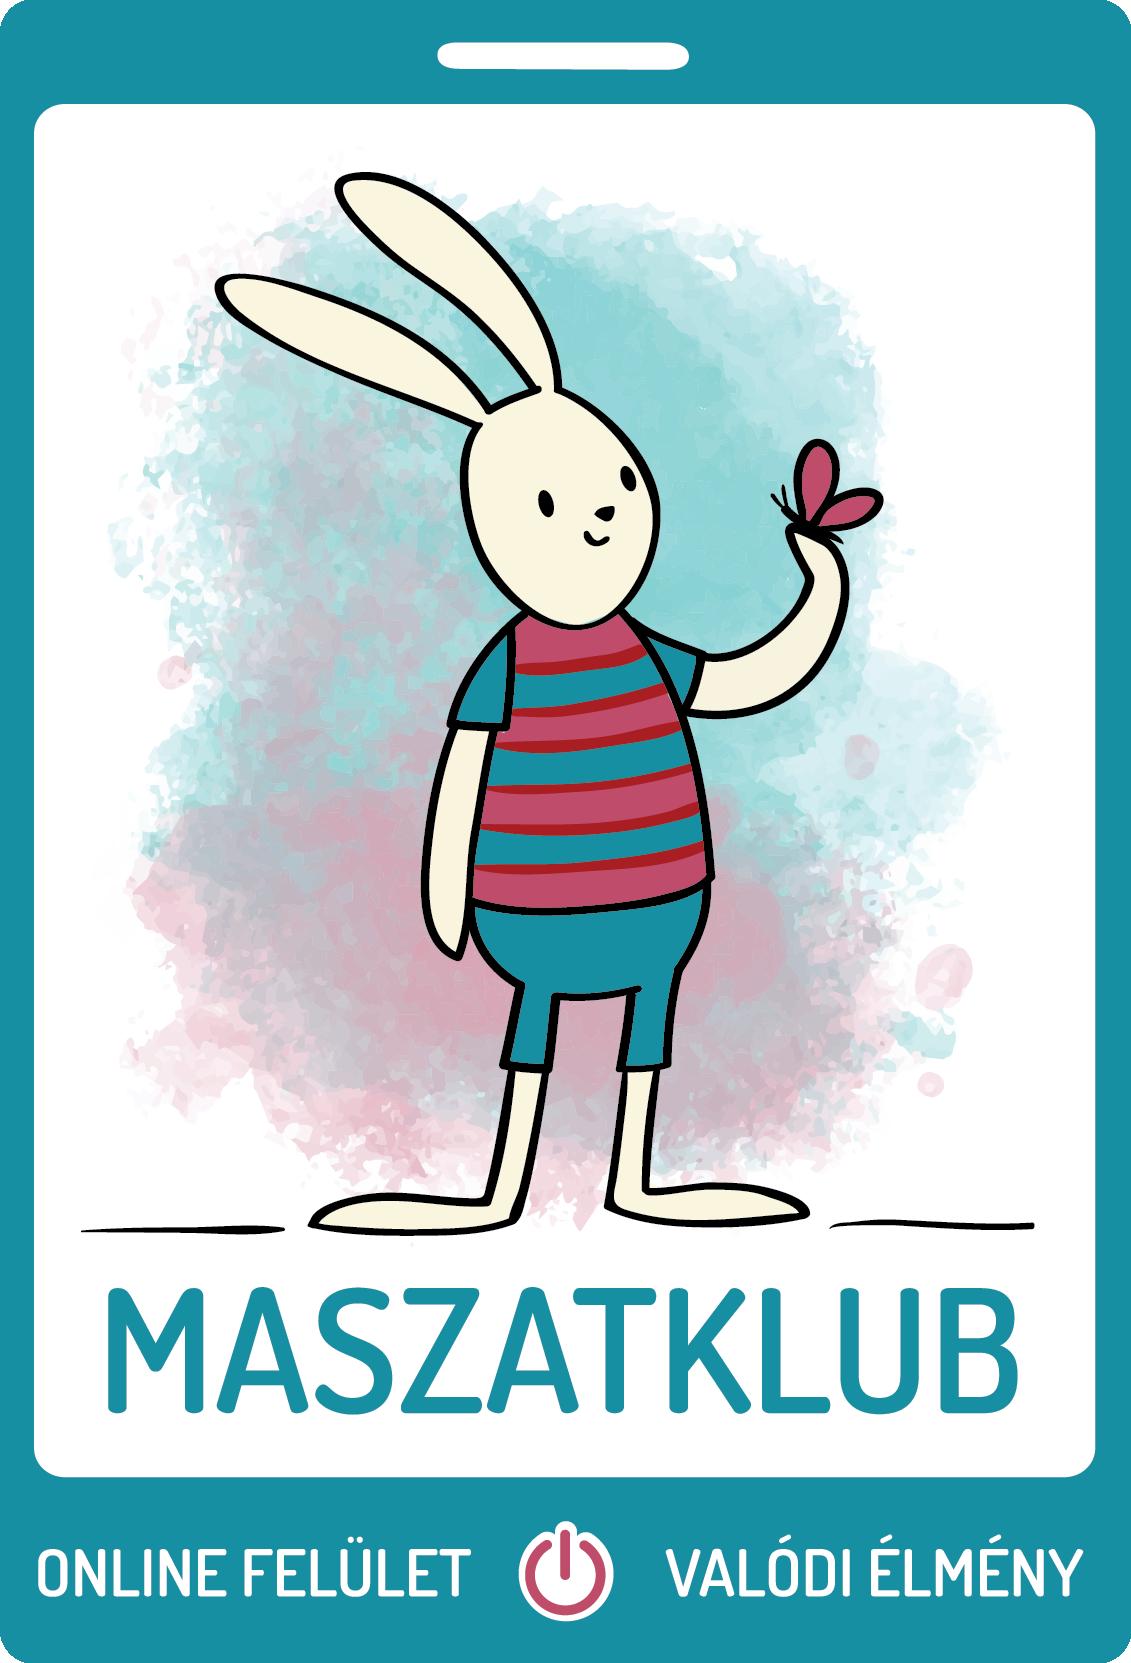 MaszatKlub